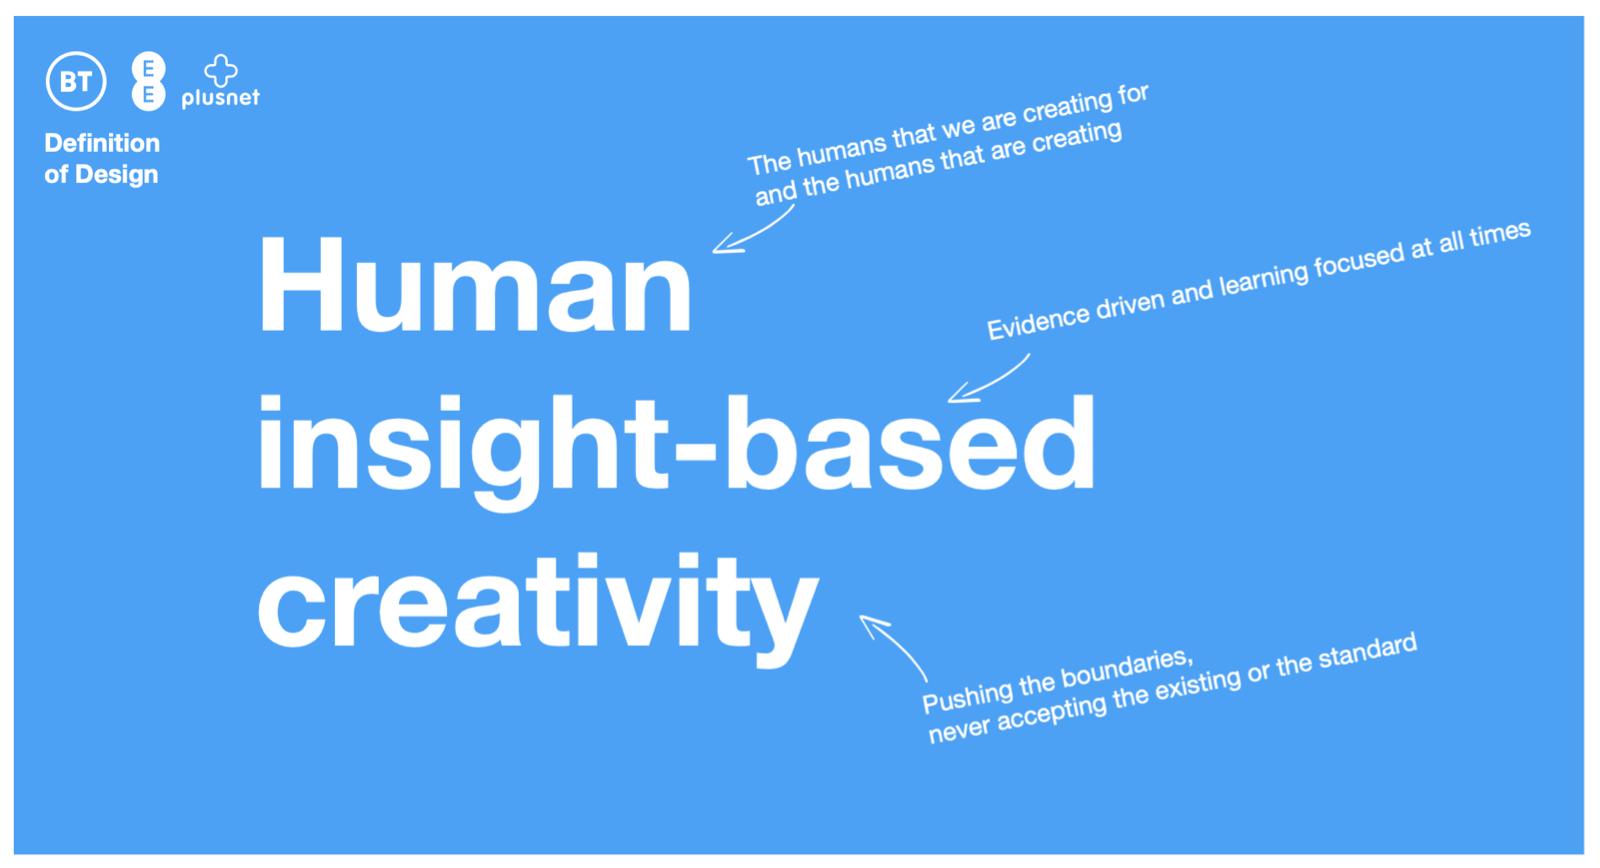 An infographic describing BT's definition of design: 'Human insight-based creativity'.